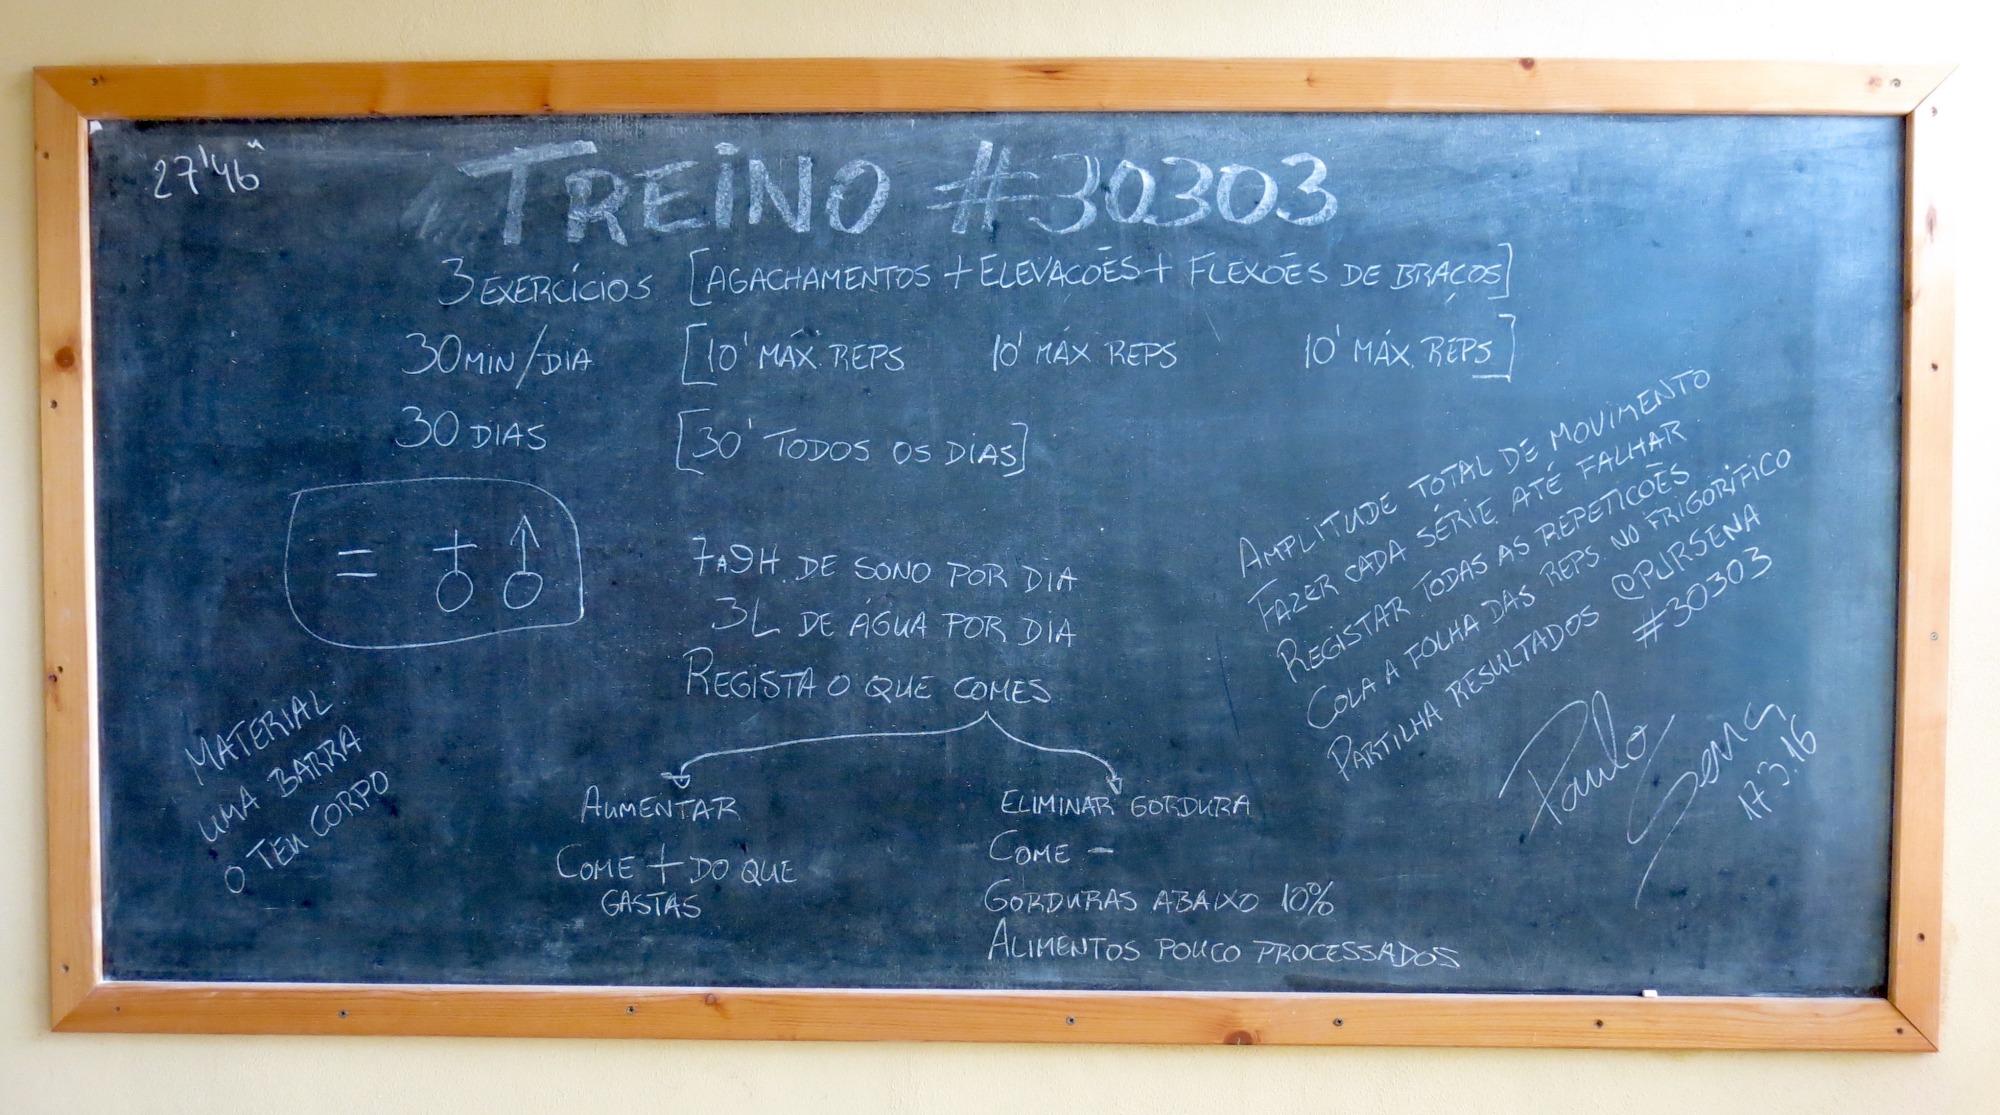 Treino #30303